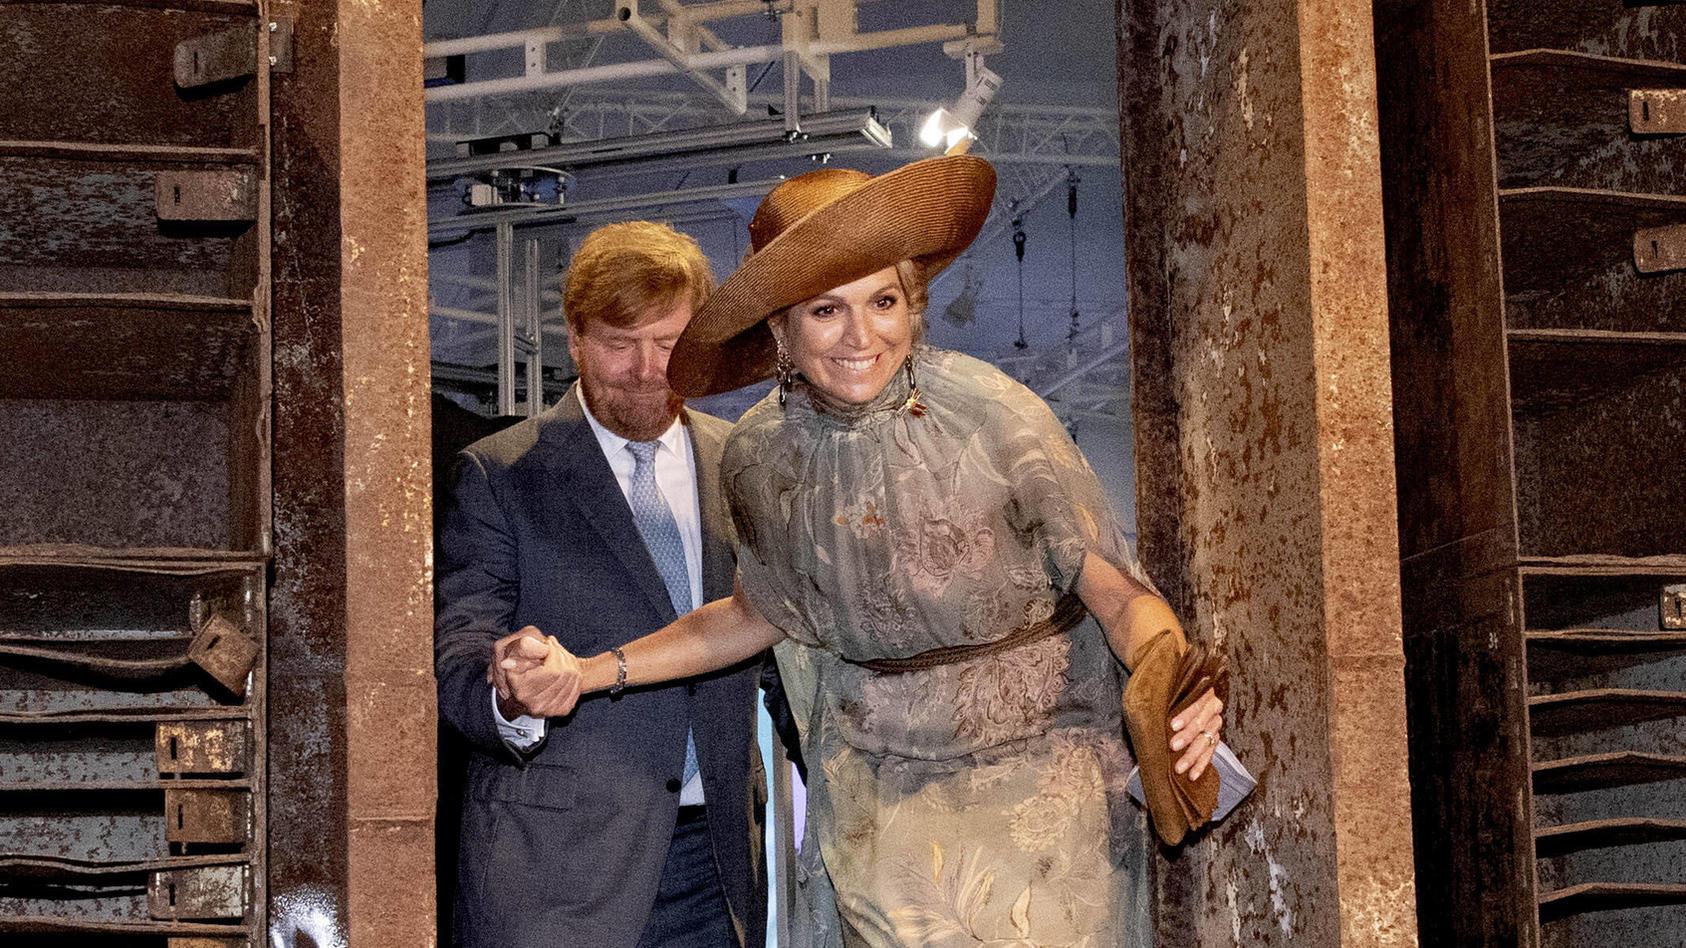 Hier betritt Königin Máxima den Techno-Club Tresor - oder doch nicht?